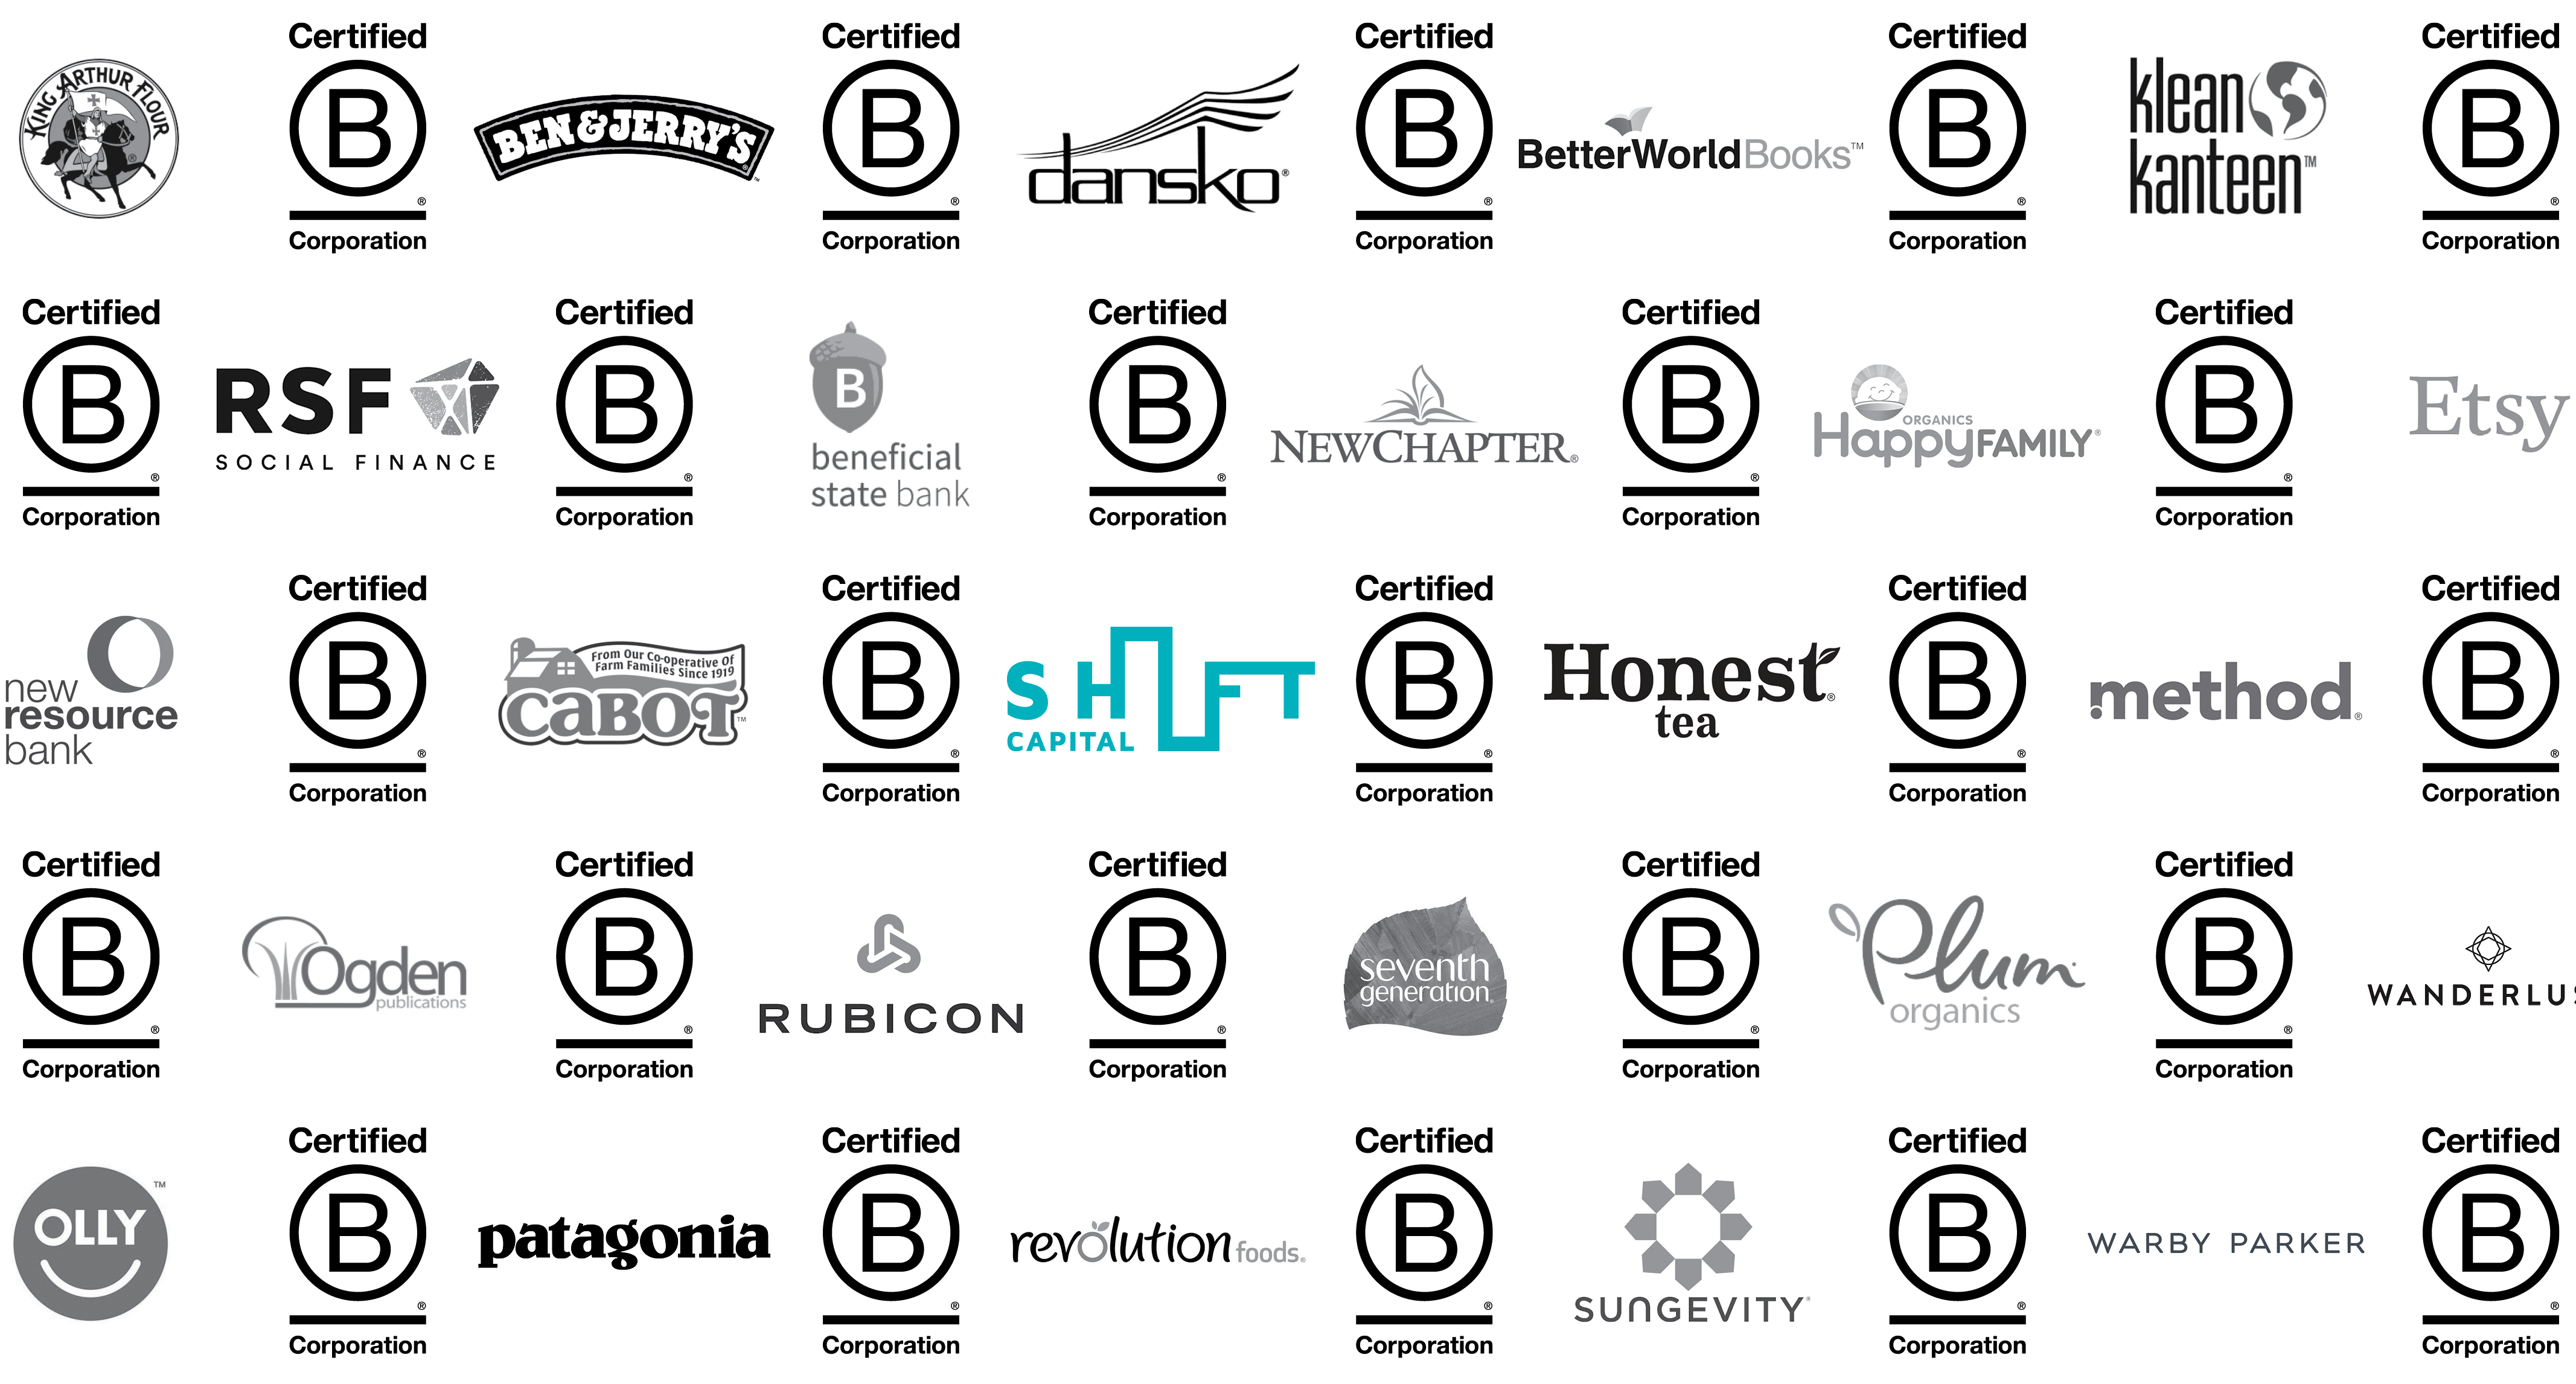 SHIFT B Corp social impact real estate philadelphia